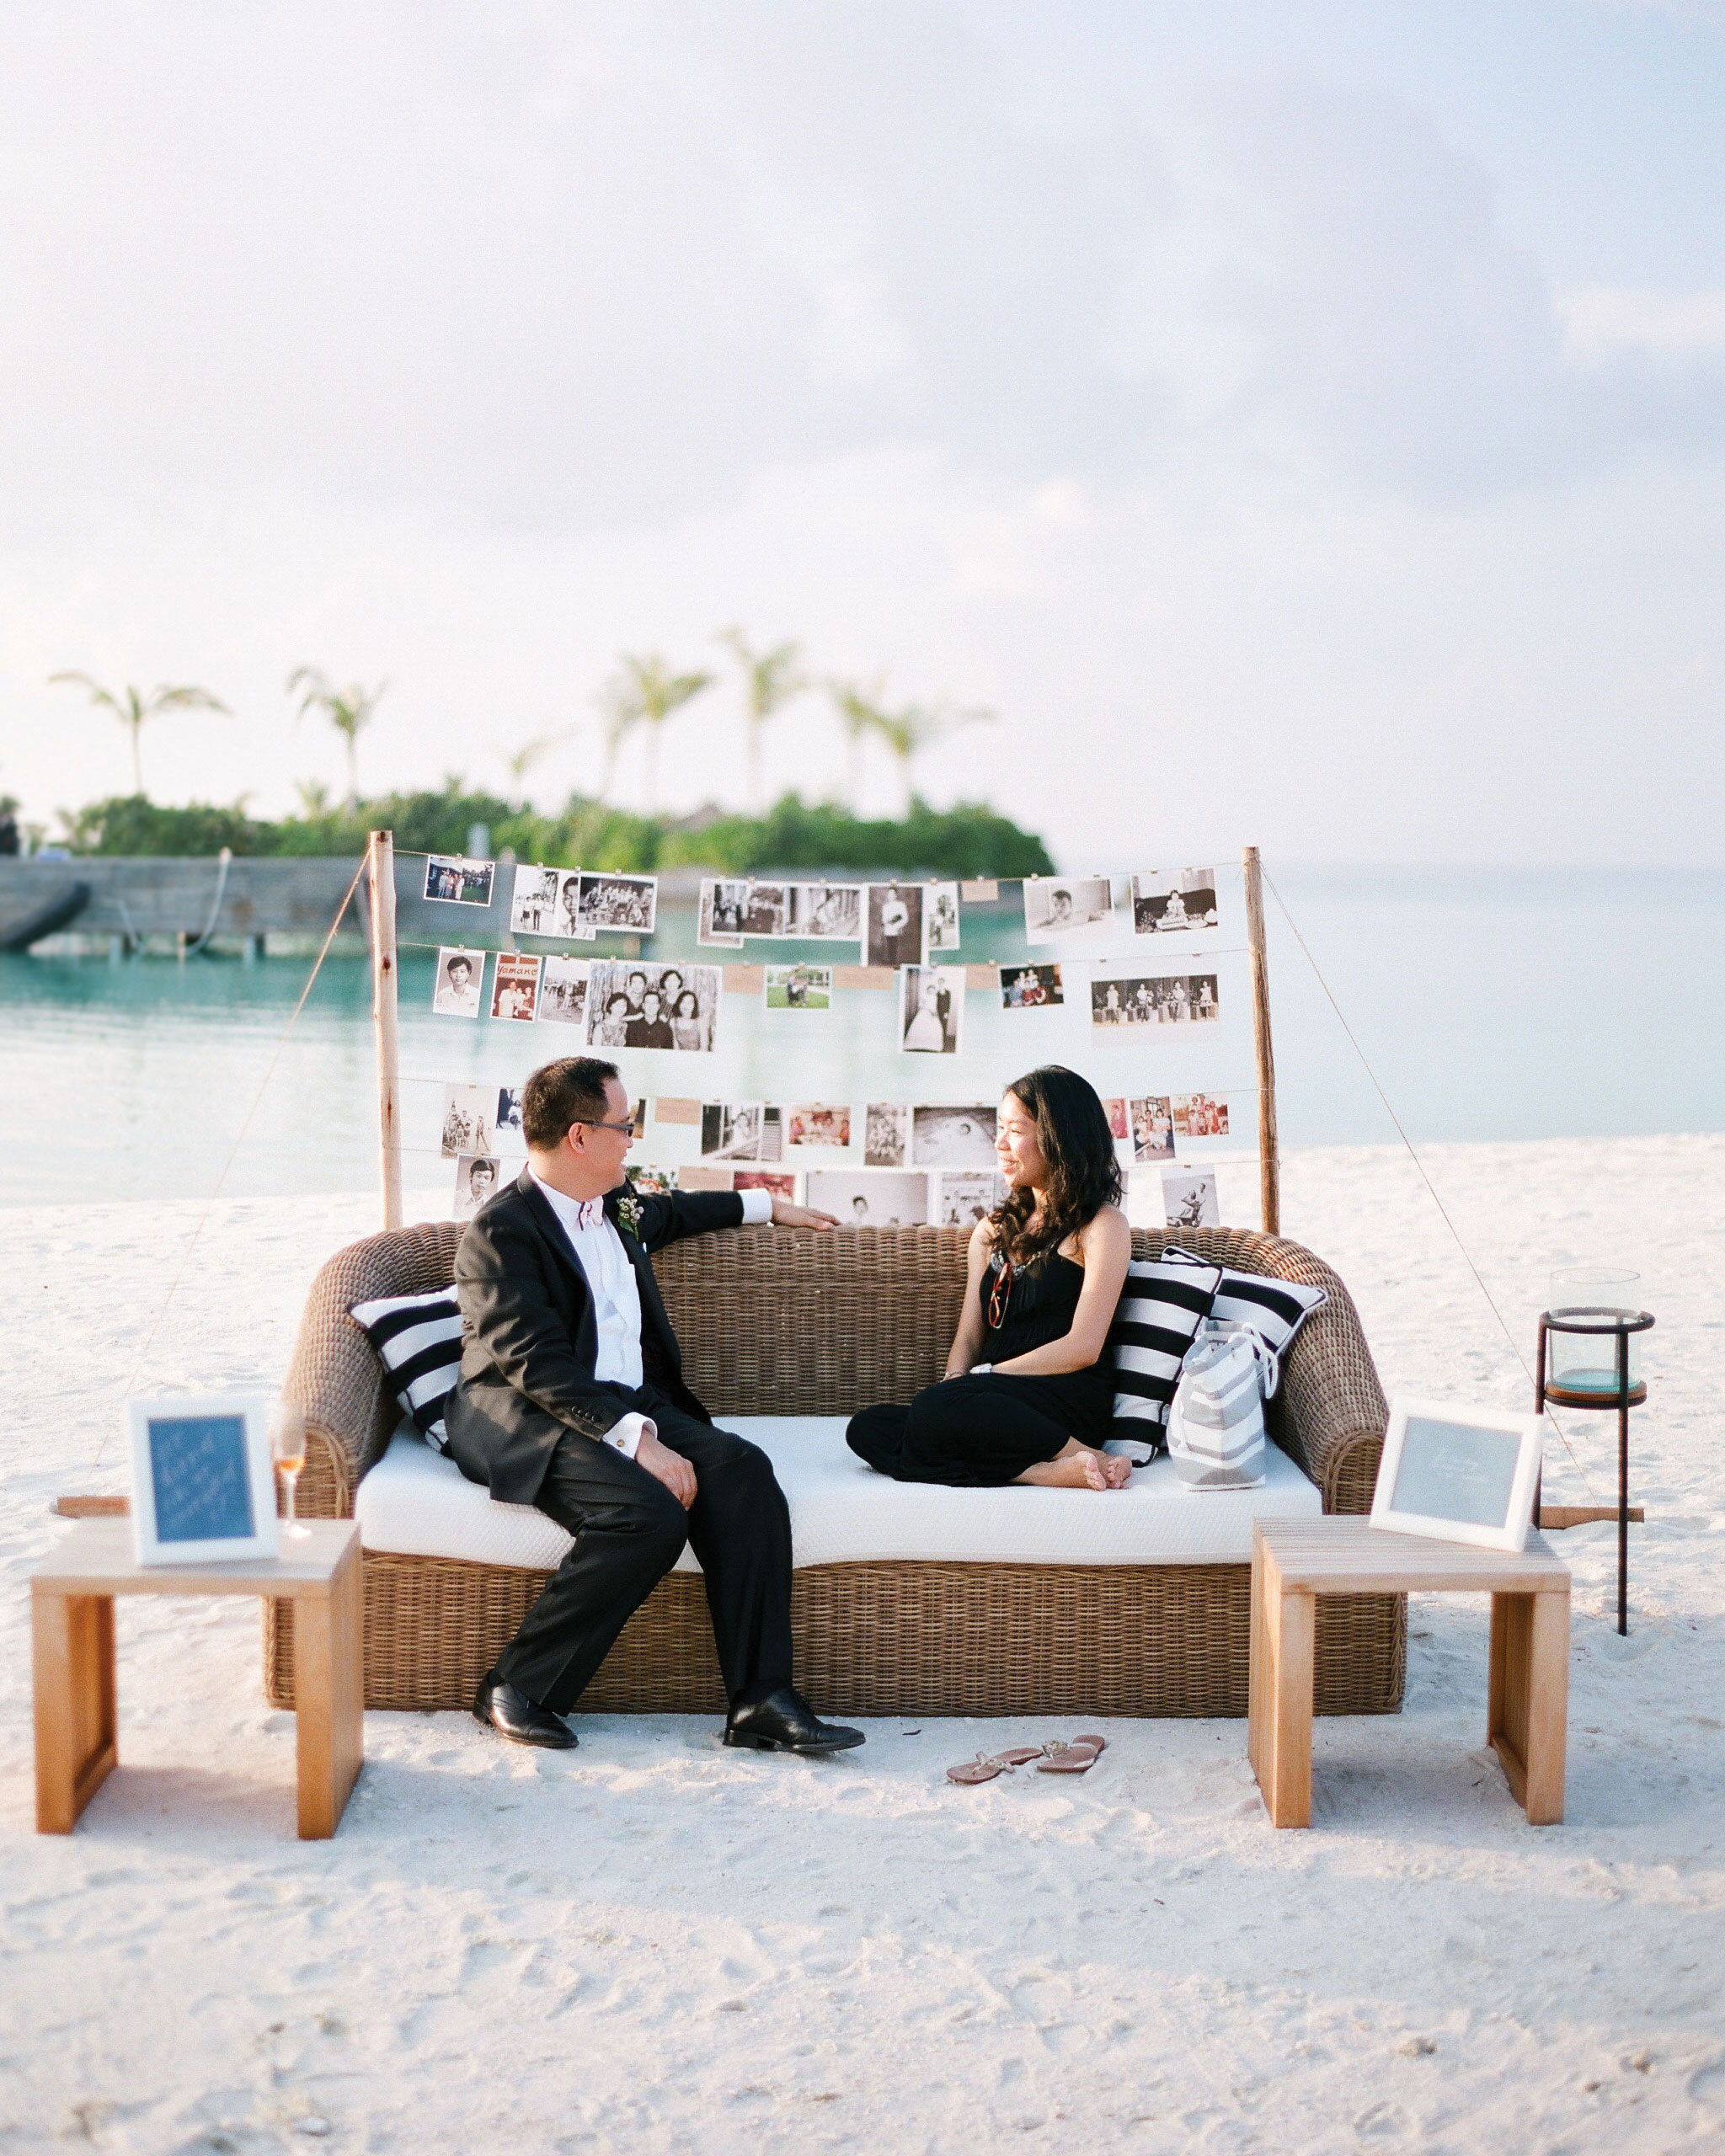 peony-richard-wedding-maldives-lounge-area-on-beach-1873-s112383.jpg